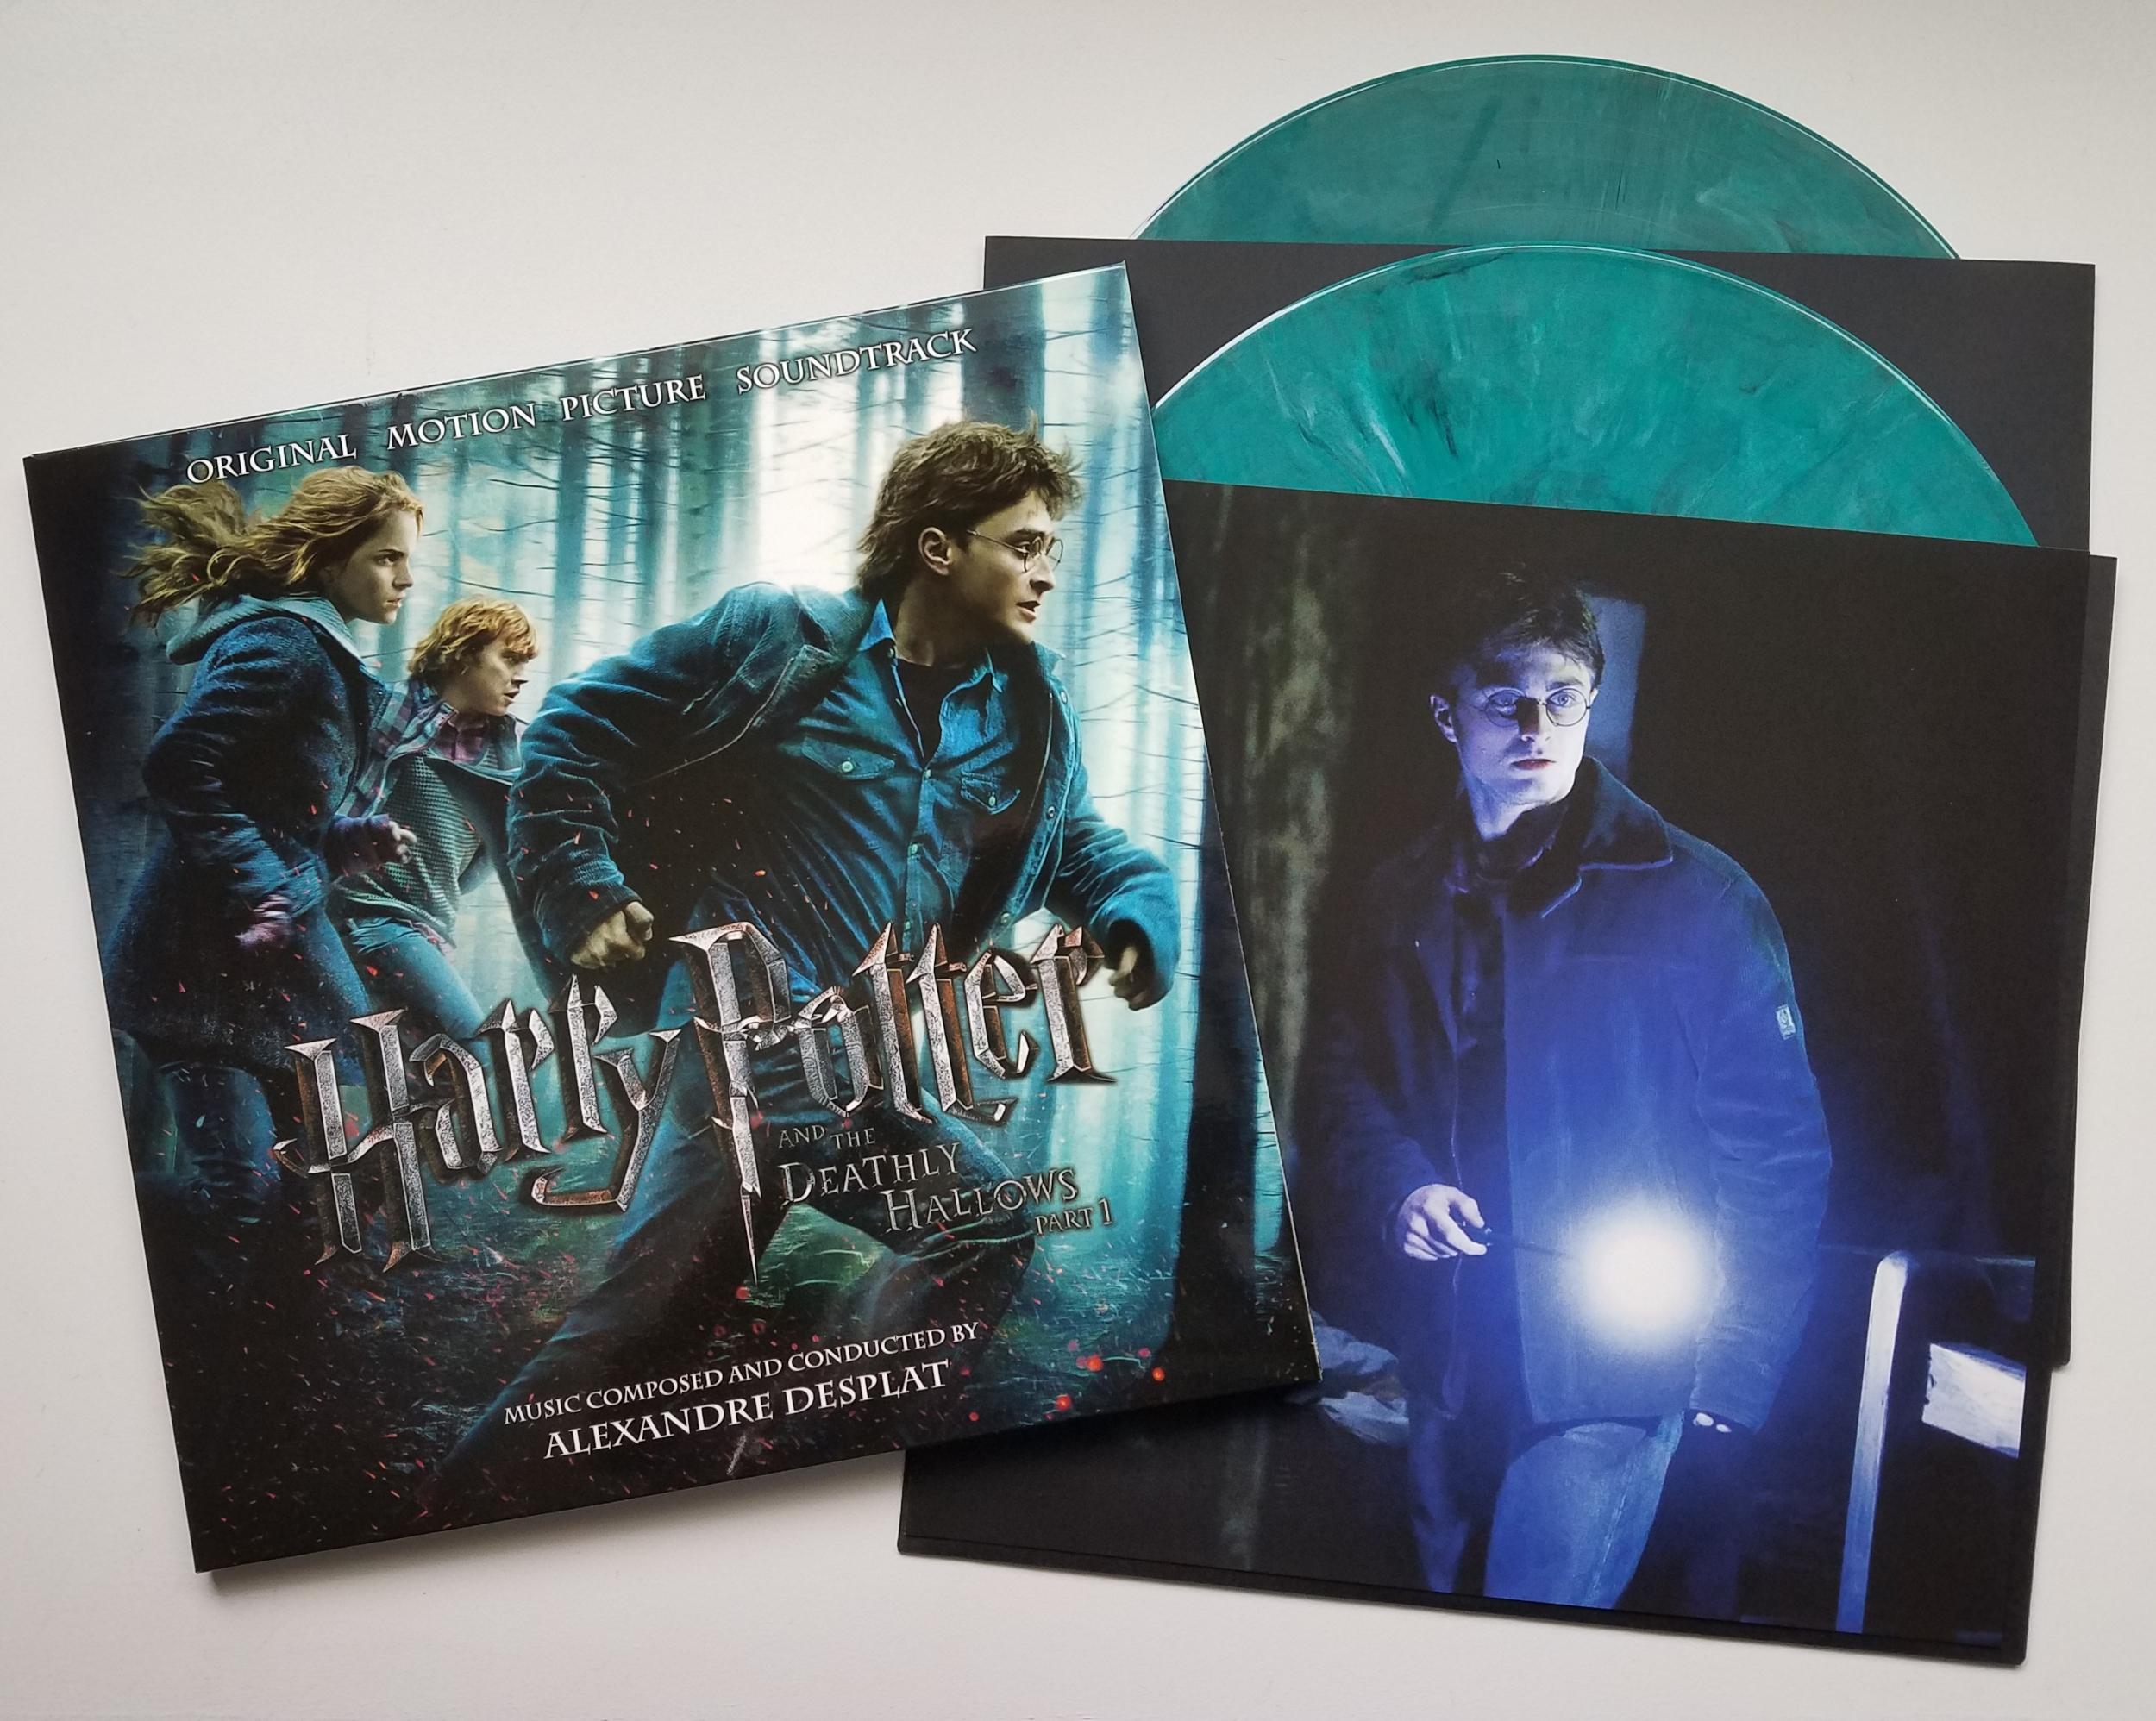 Harry Potter and the Deathly Hallows Pt. 1 Original Soundtrack by Alexandre Desplat 2xLP (Green Marbled vinyl)